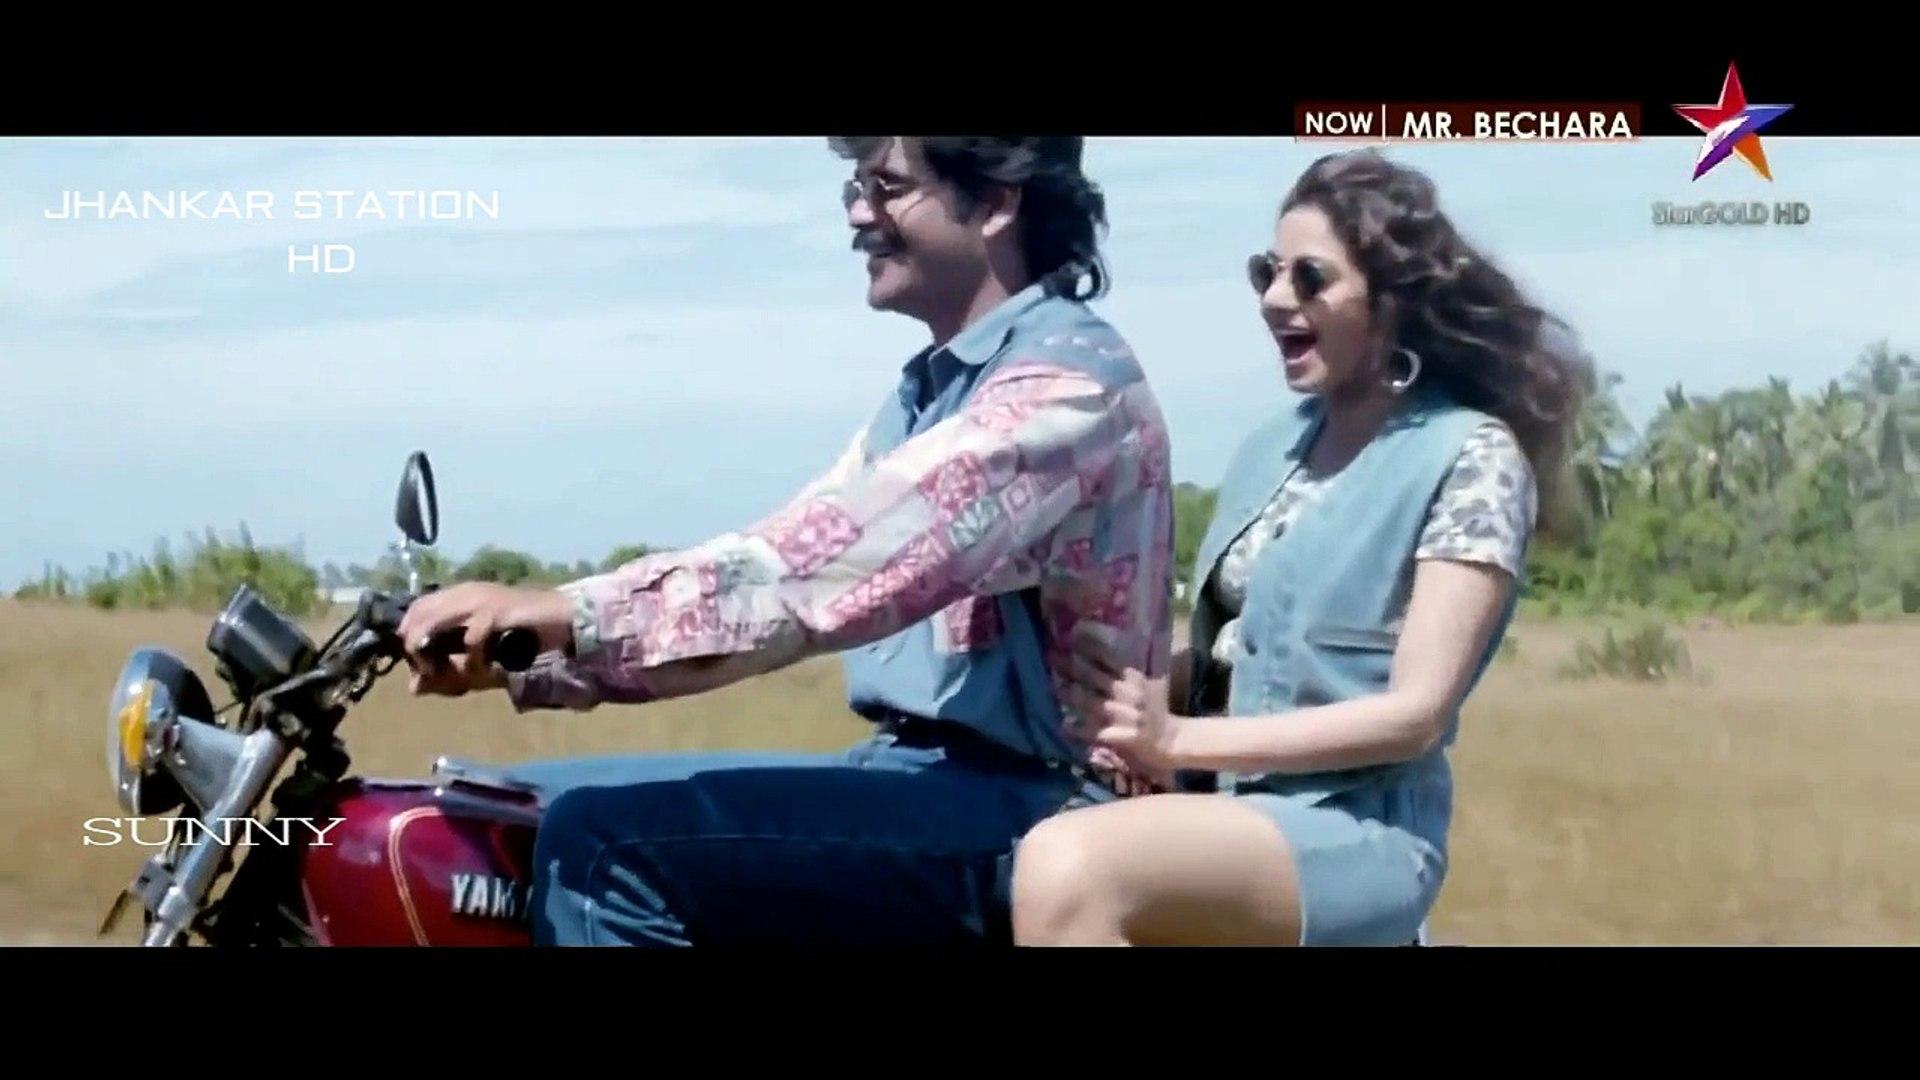 Janam meri janam Khoyi Khoyi ankhon maiin_With((Jhankar beats))  _(Mr Bechara)